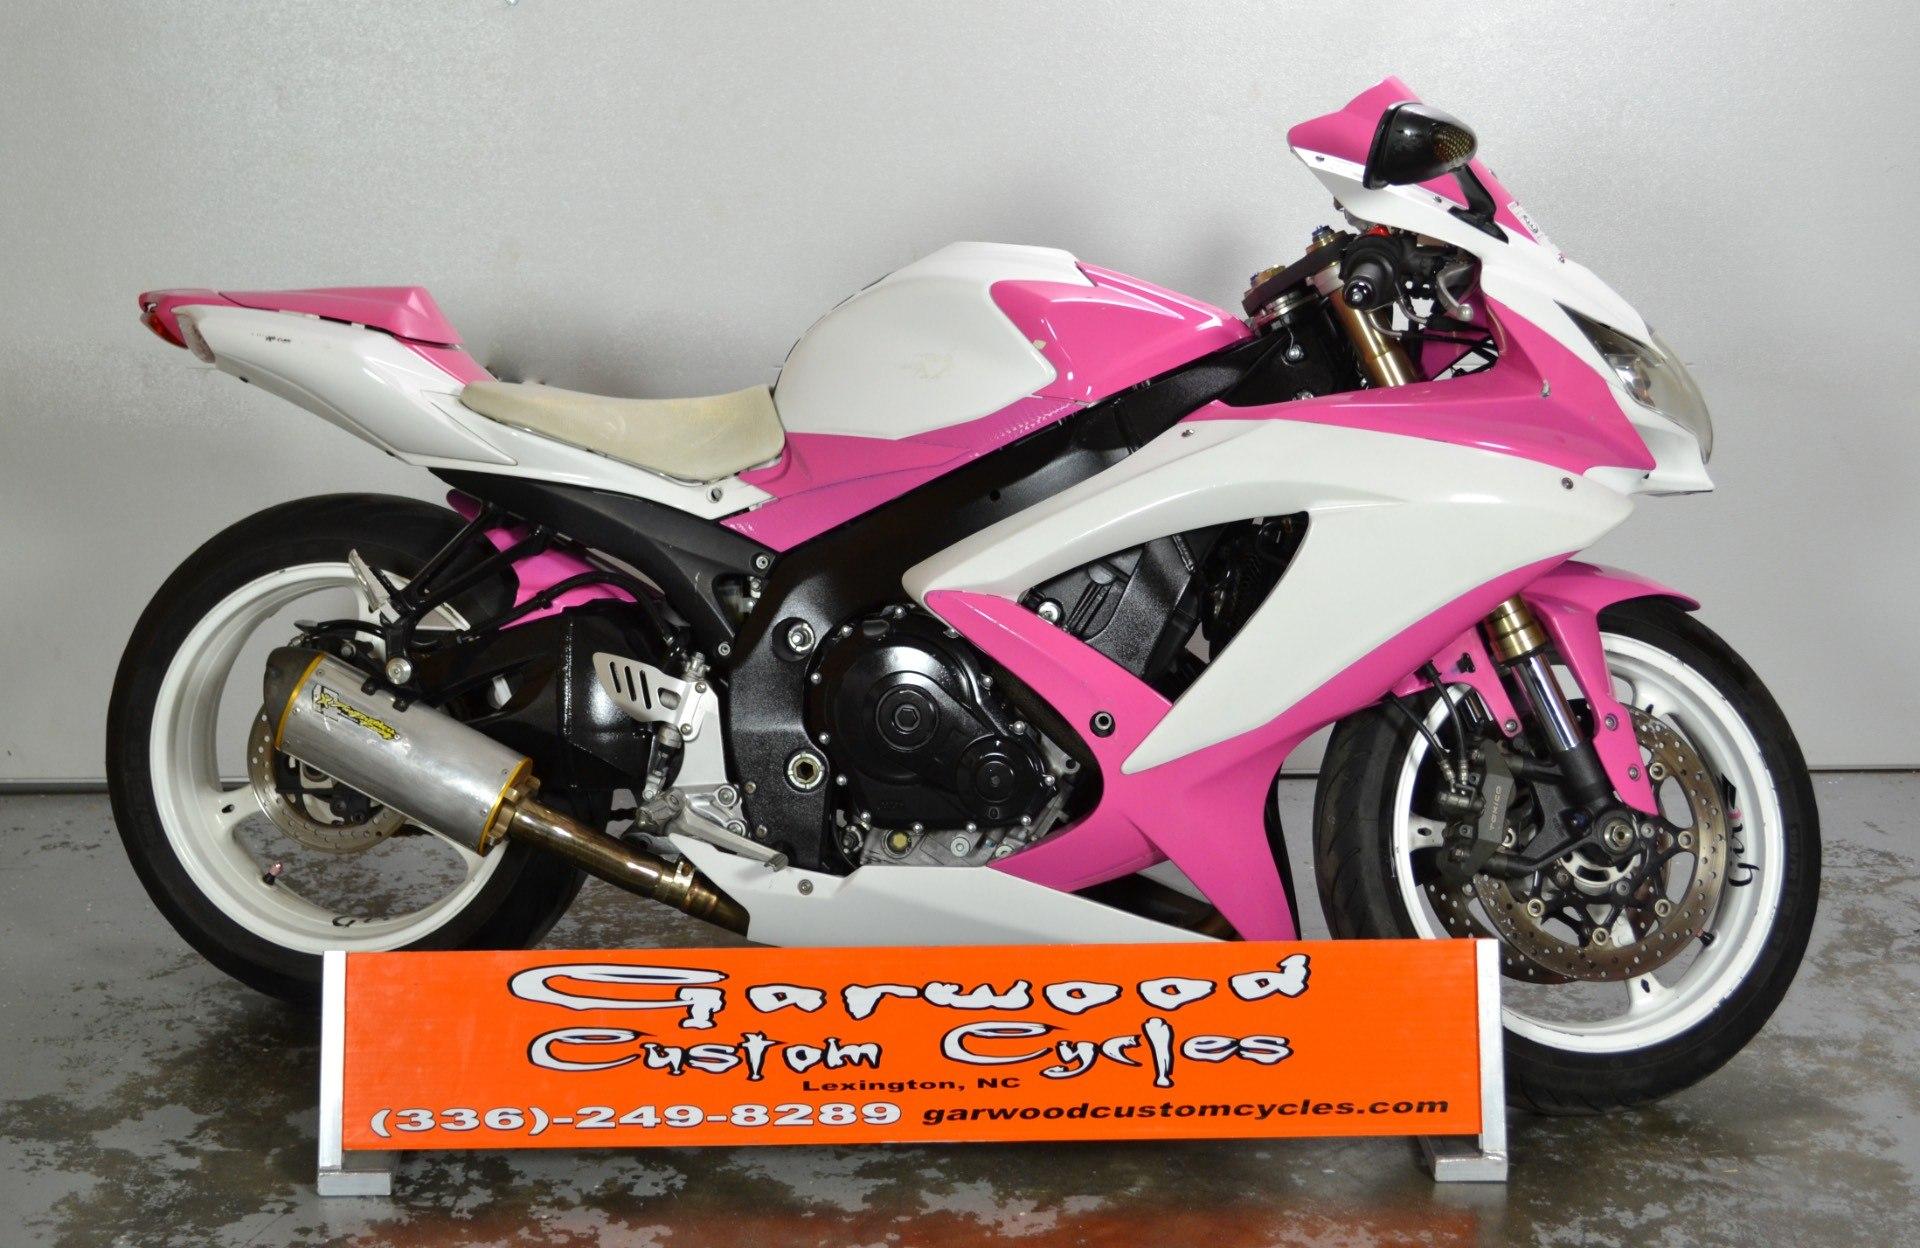 2009 suzuki gsxr 600 motorcycles lexington north carolina. Black Bedroom Furniture Sets. Home Design Ideas